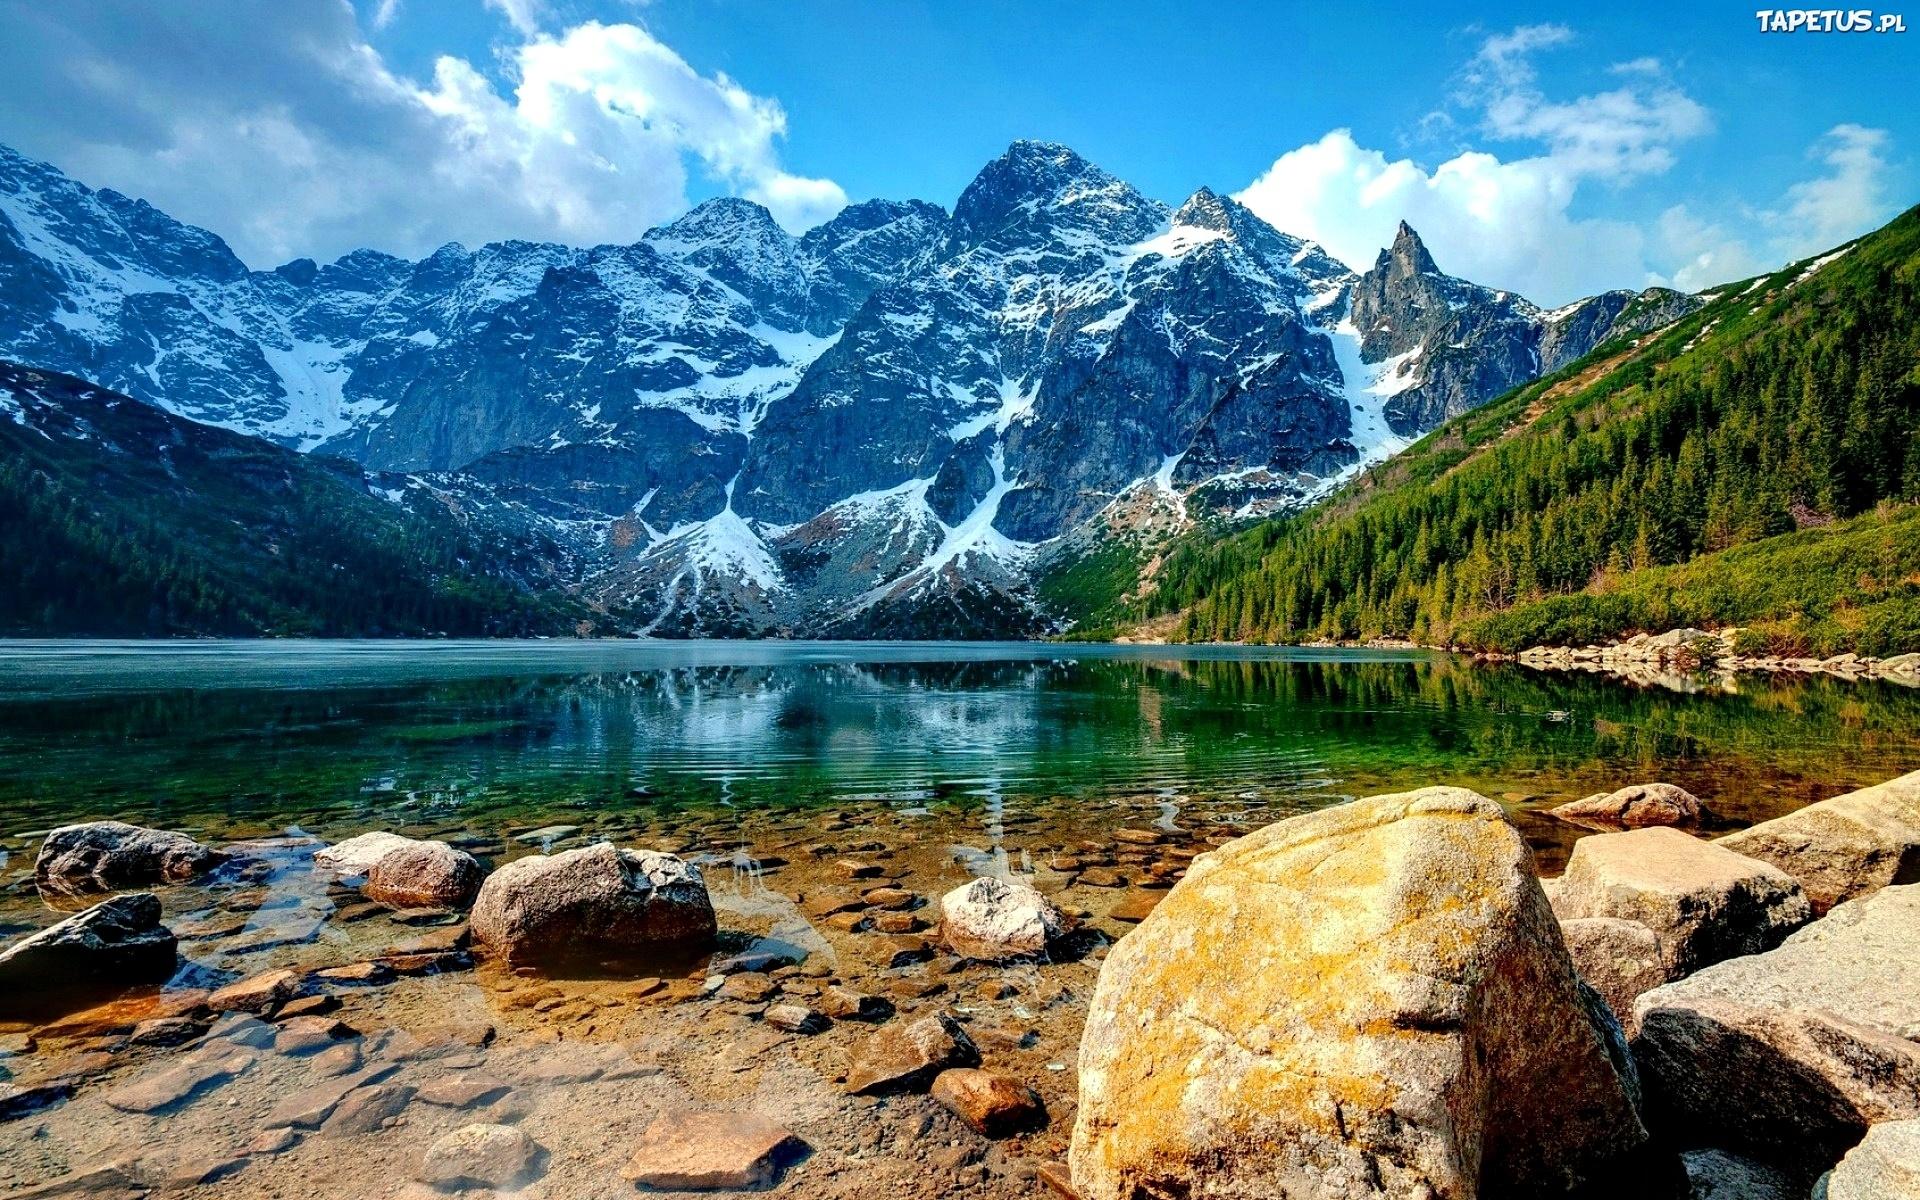 Znalezione obrazy dla zapytania góry morskie oko